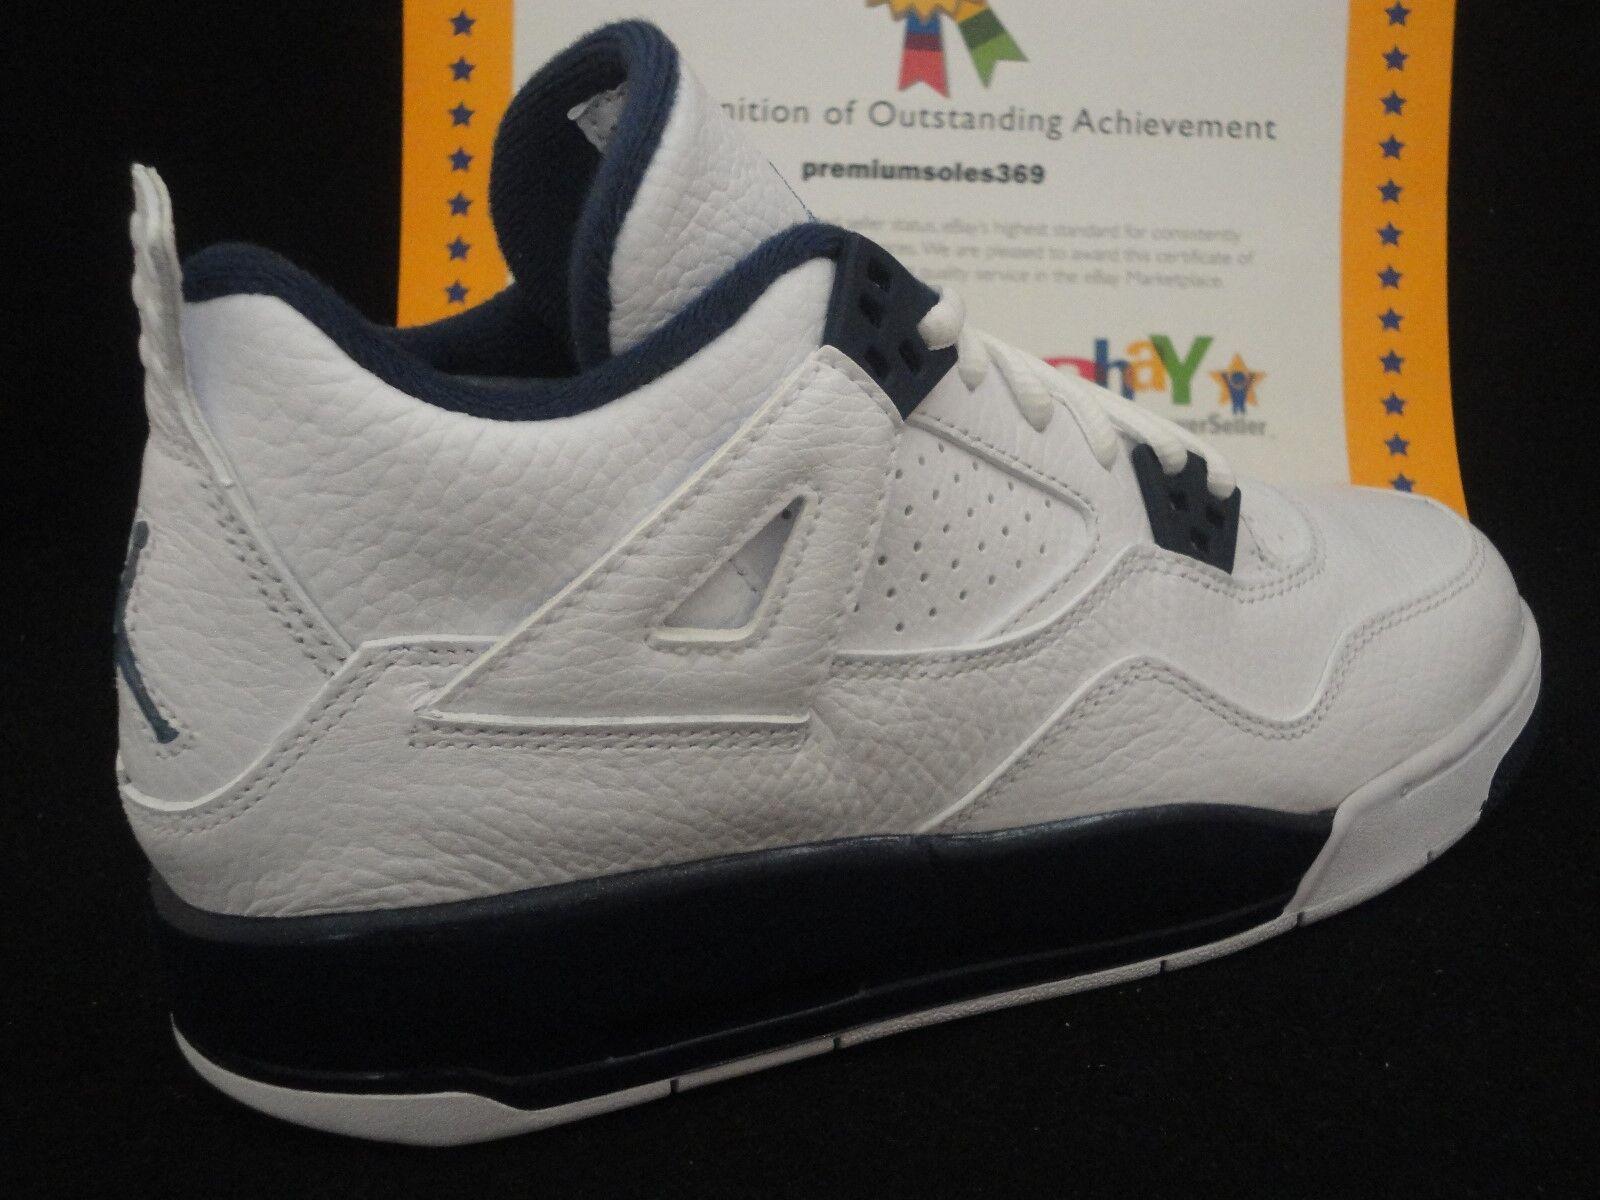 size 7 new collection pre order Nike Air Jordan 4 Retro BG, White / Legend Blue / Mid Navy, Size 5.5Y, Eur  38